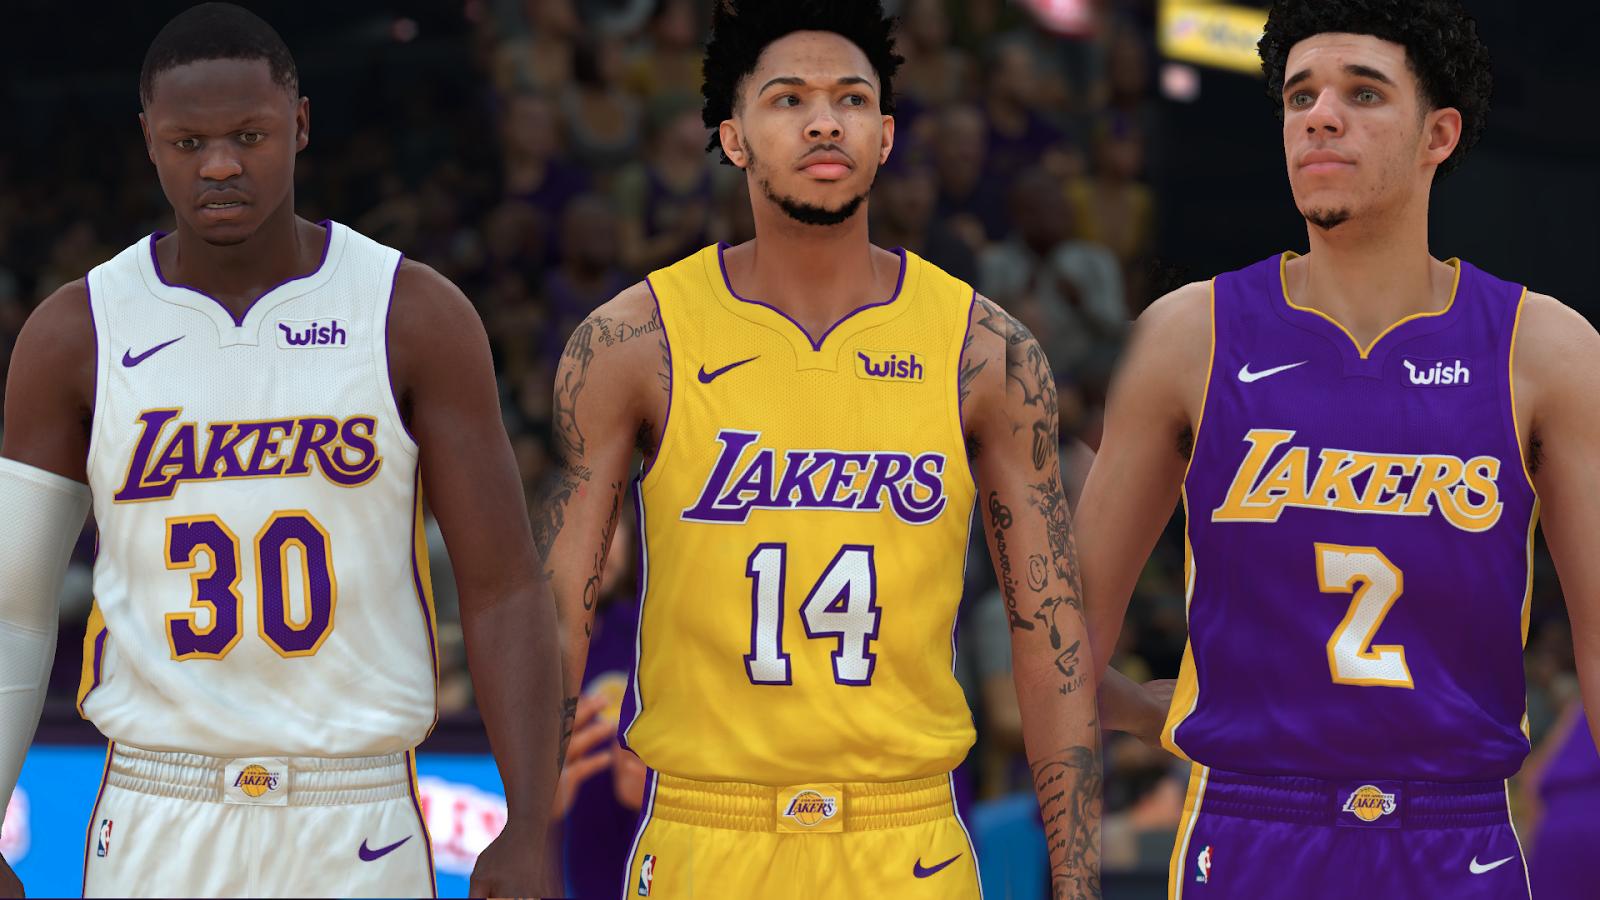 Nba Basketball Los Angeles Lakers: NBA 2K18 Los Angeles Lakers Jersey By Pinoy21